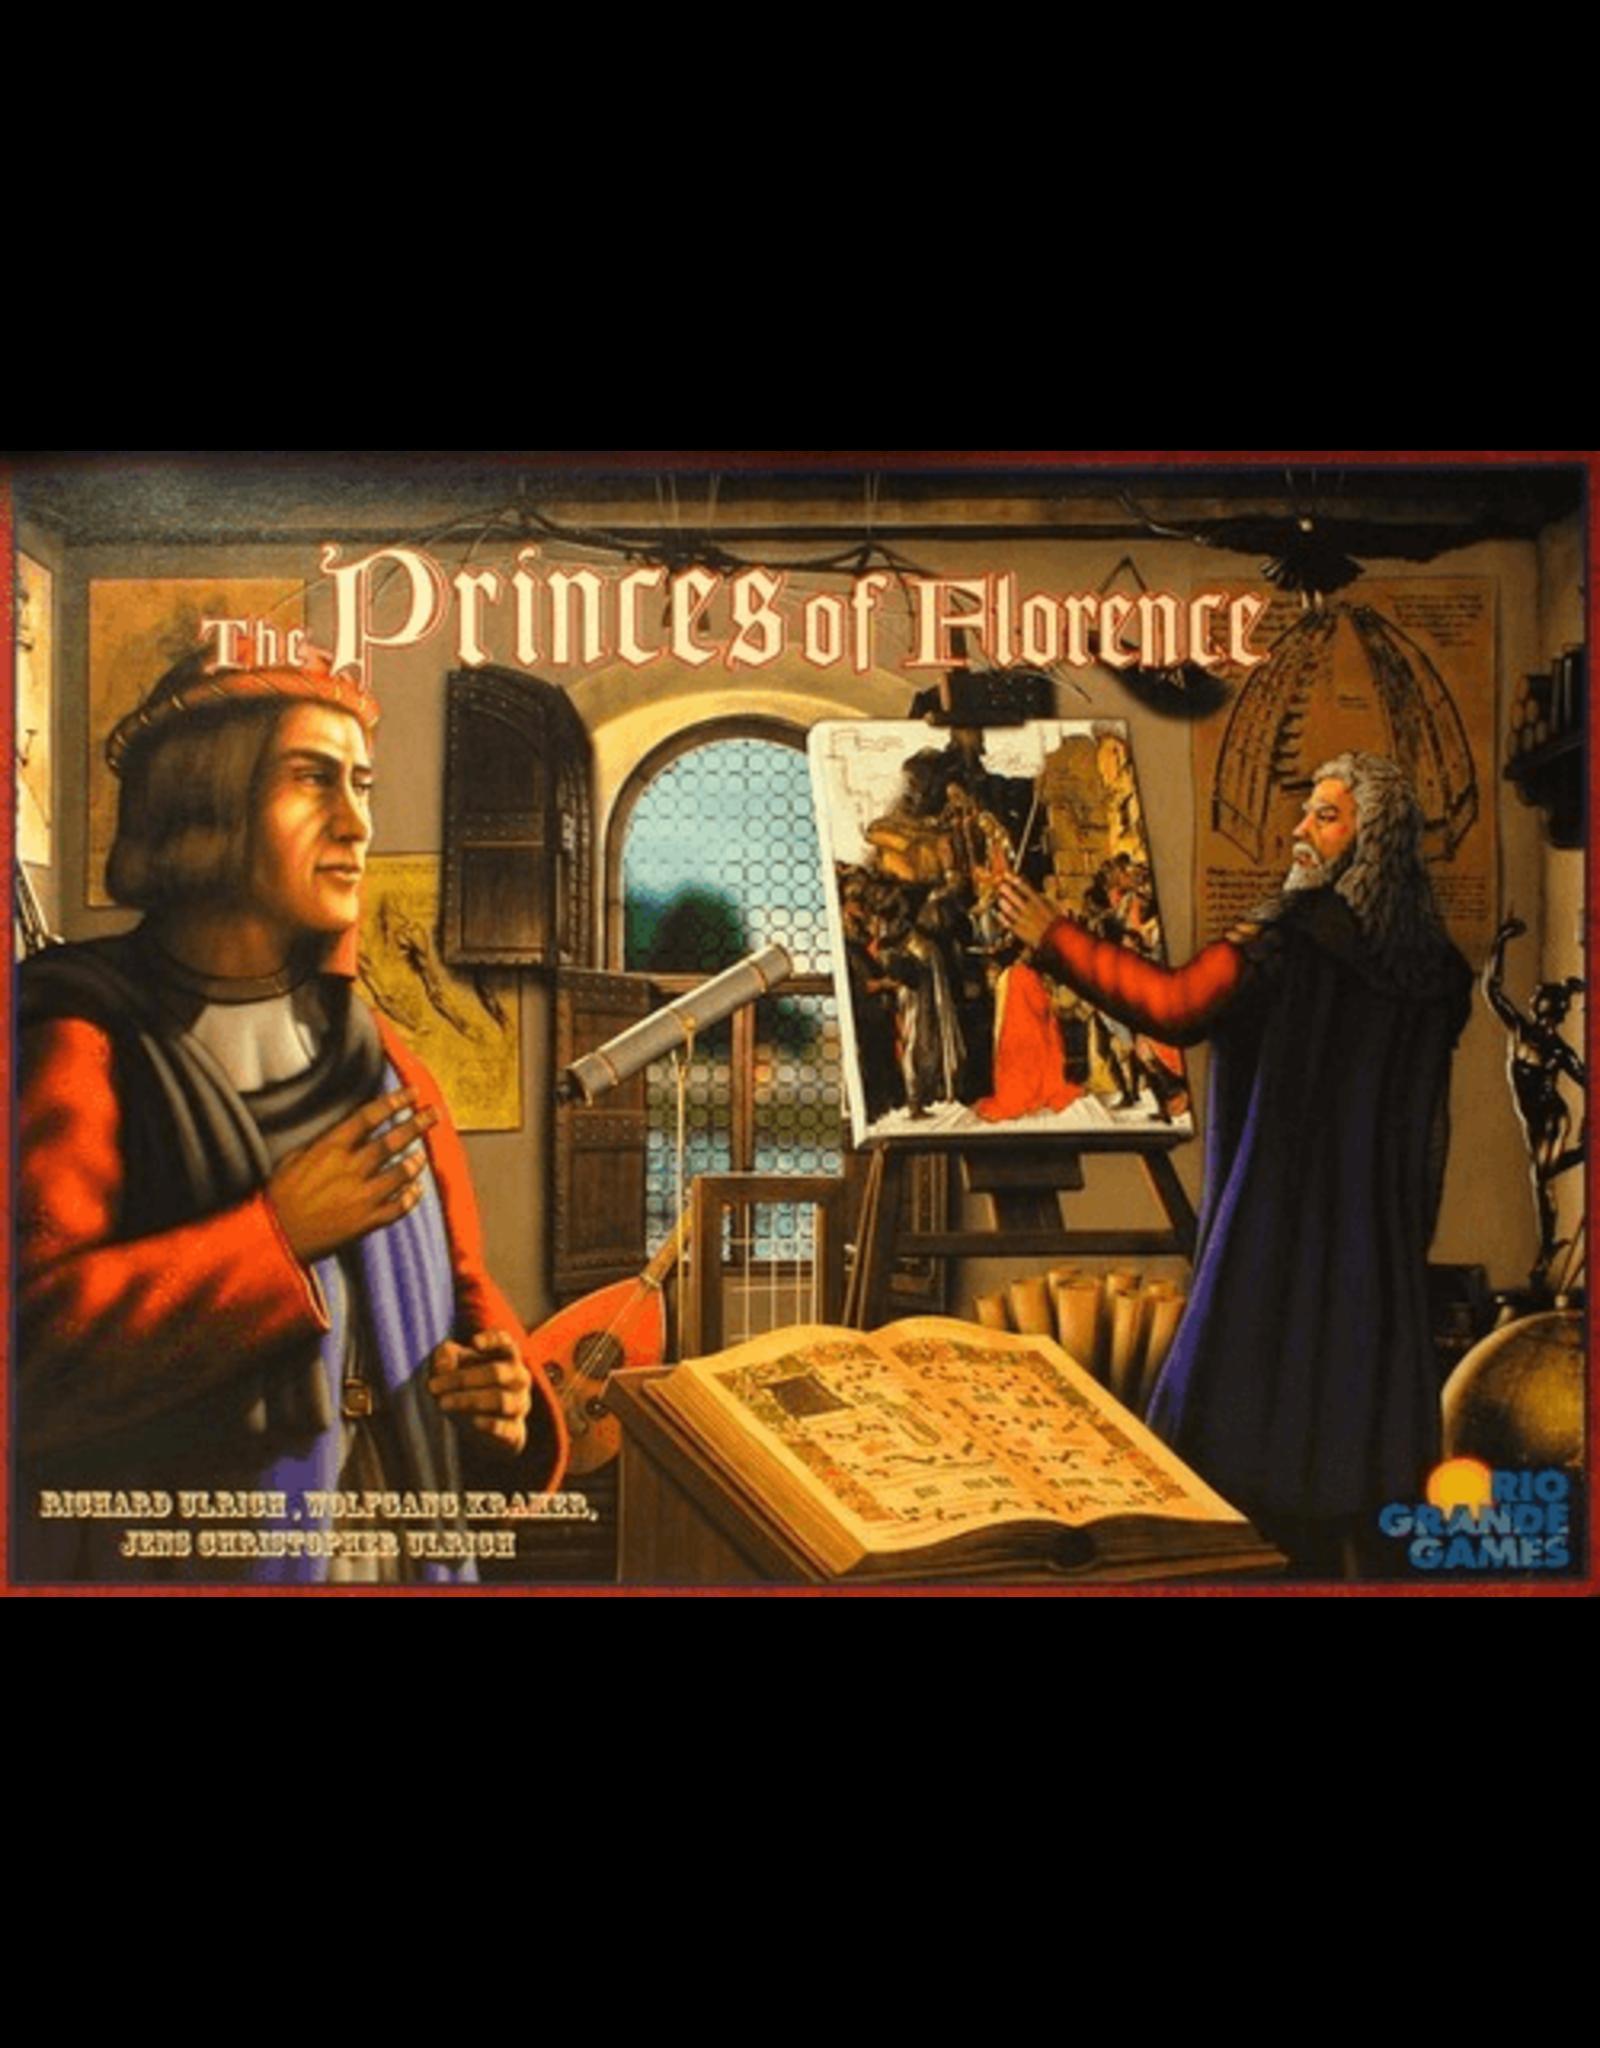 Rio Grande Games Princes of Florence